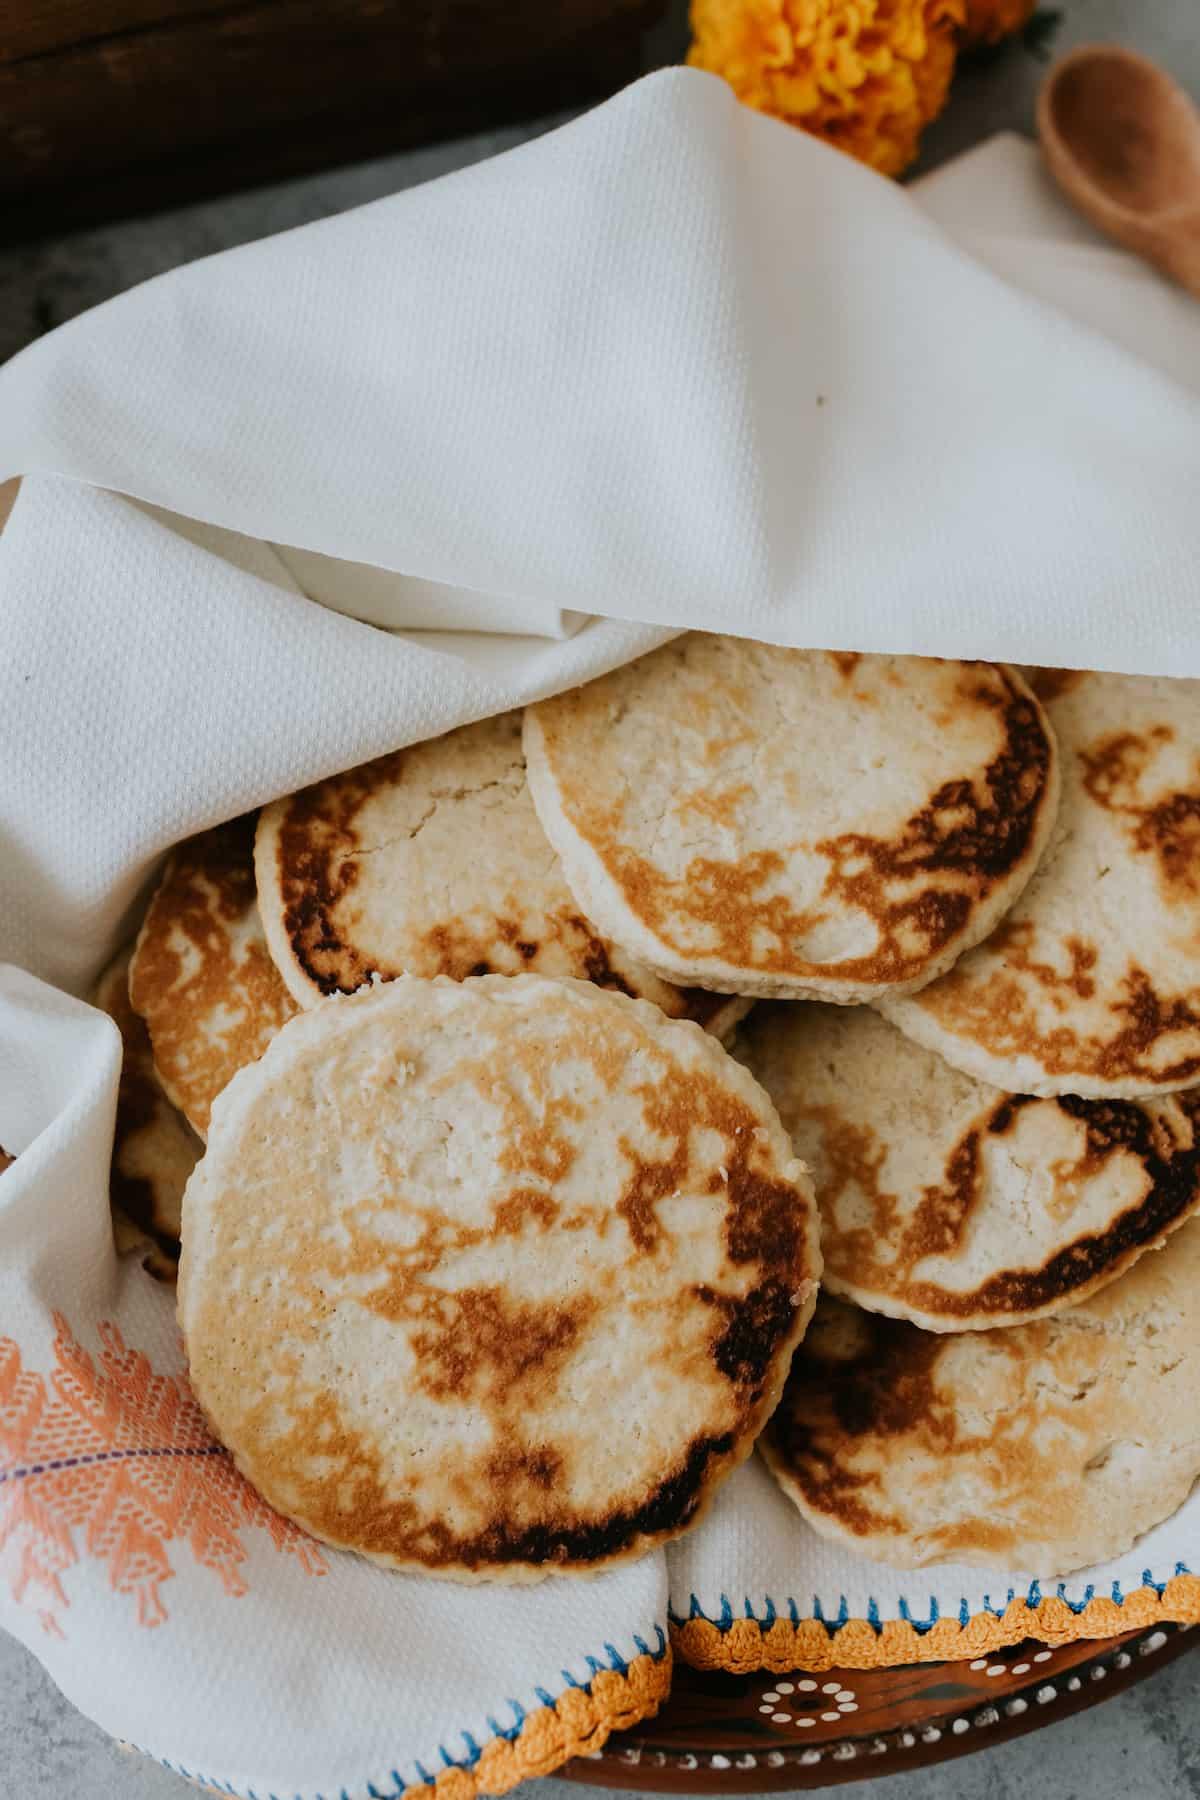 Gorditas de Azucar (Sweet Griddle Cakes) kept warm in a white Mexican linen